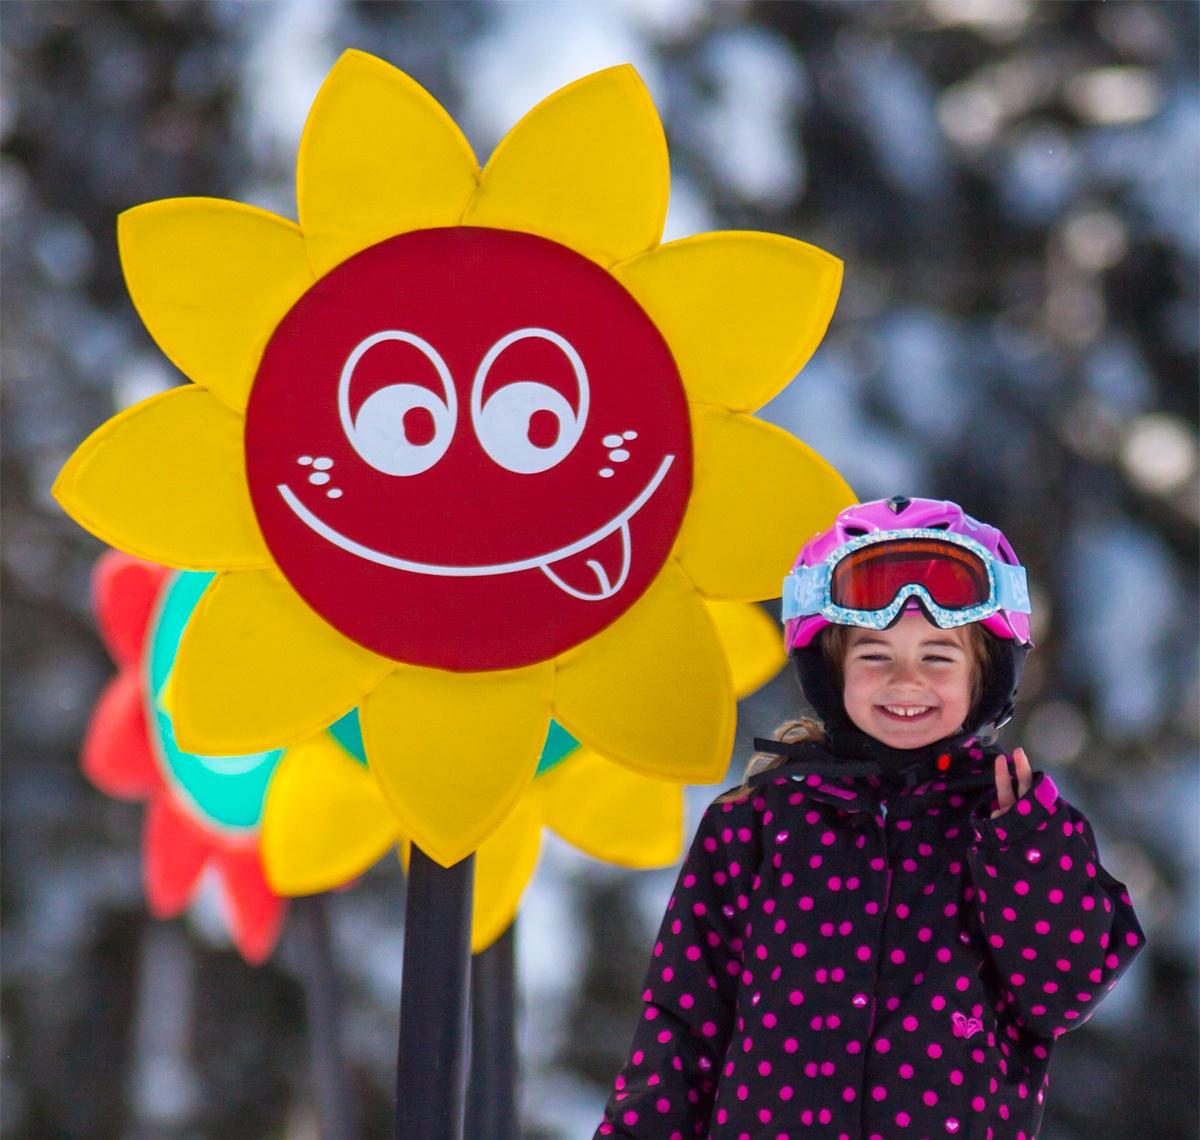 MM-Prices-1200w-x-1140-400w Kids (3-6) Mini Mountaineers - Group Ski Lessons